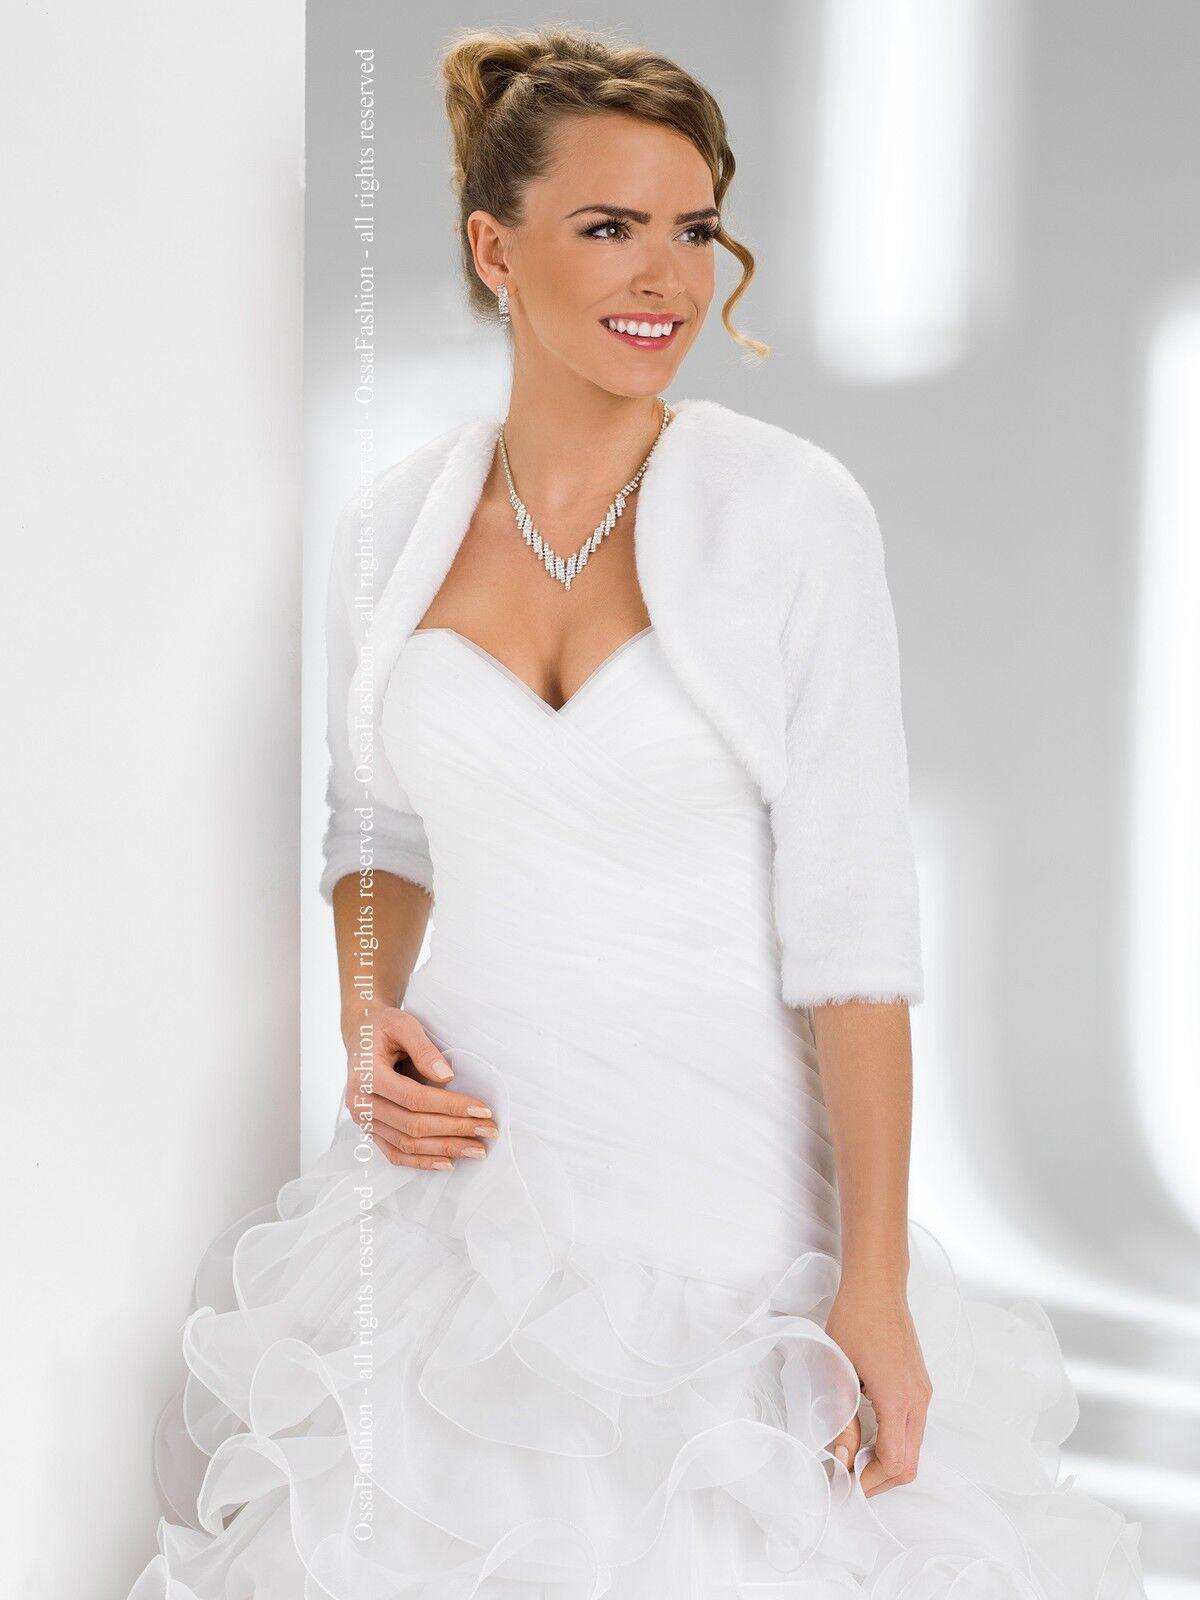 New Women Wedding Faux Fur Top Bridal Bolero Jacket Shrug ...